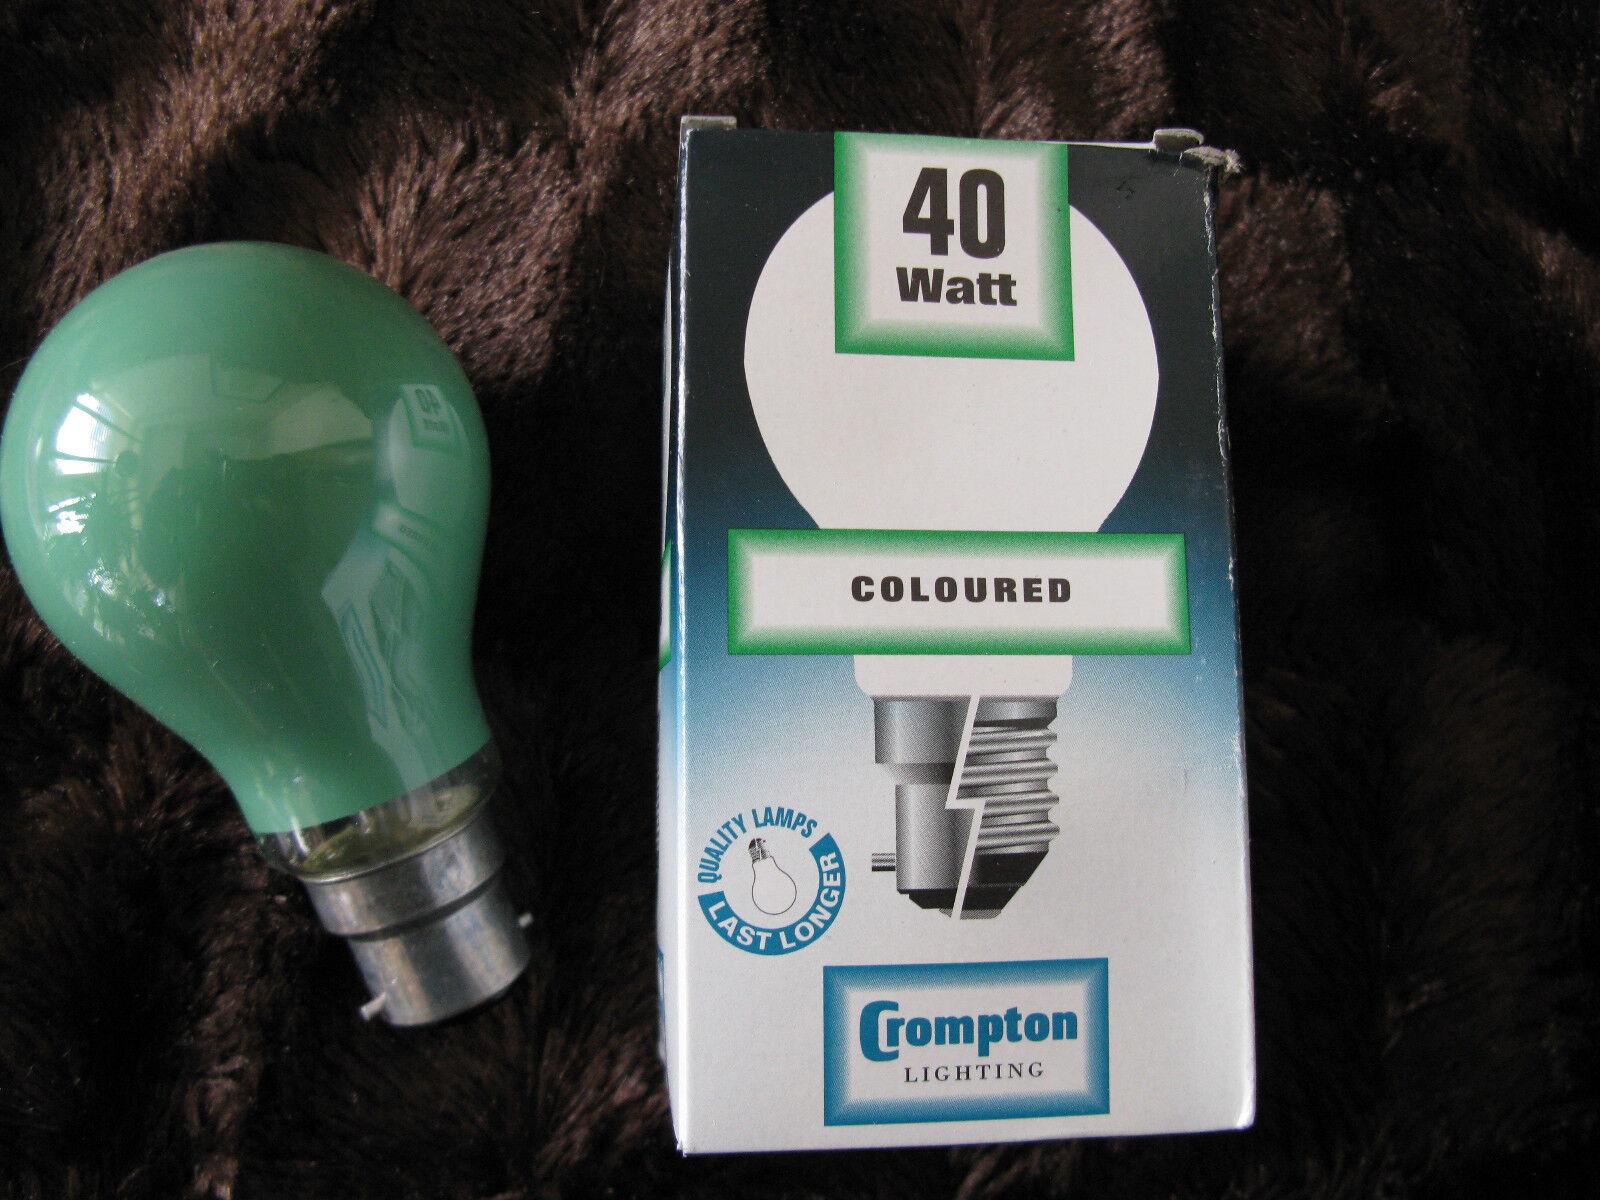 12 x Crompton 40W GREEN BC B22 Coloured Lamp Light Bulb 240V Job Lot UK Seller